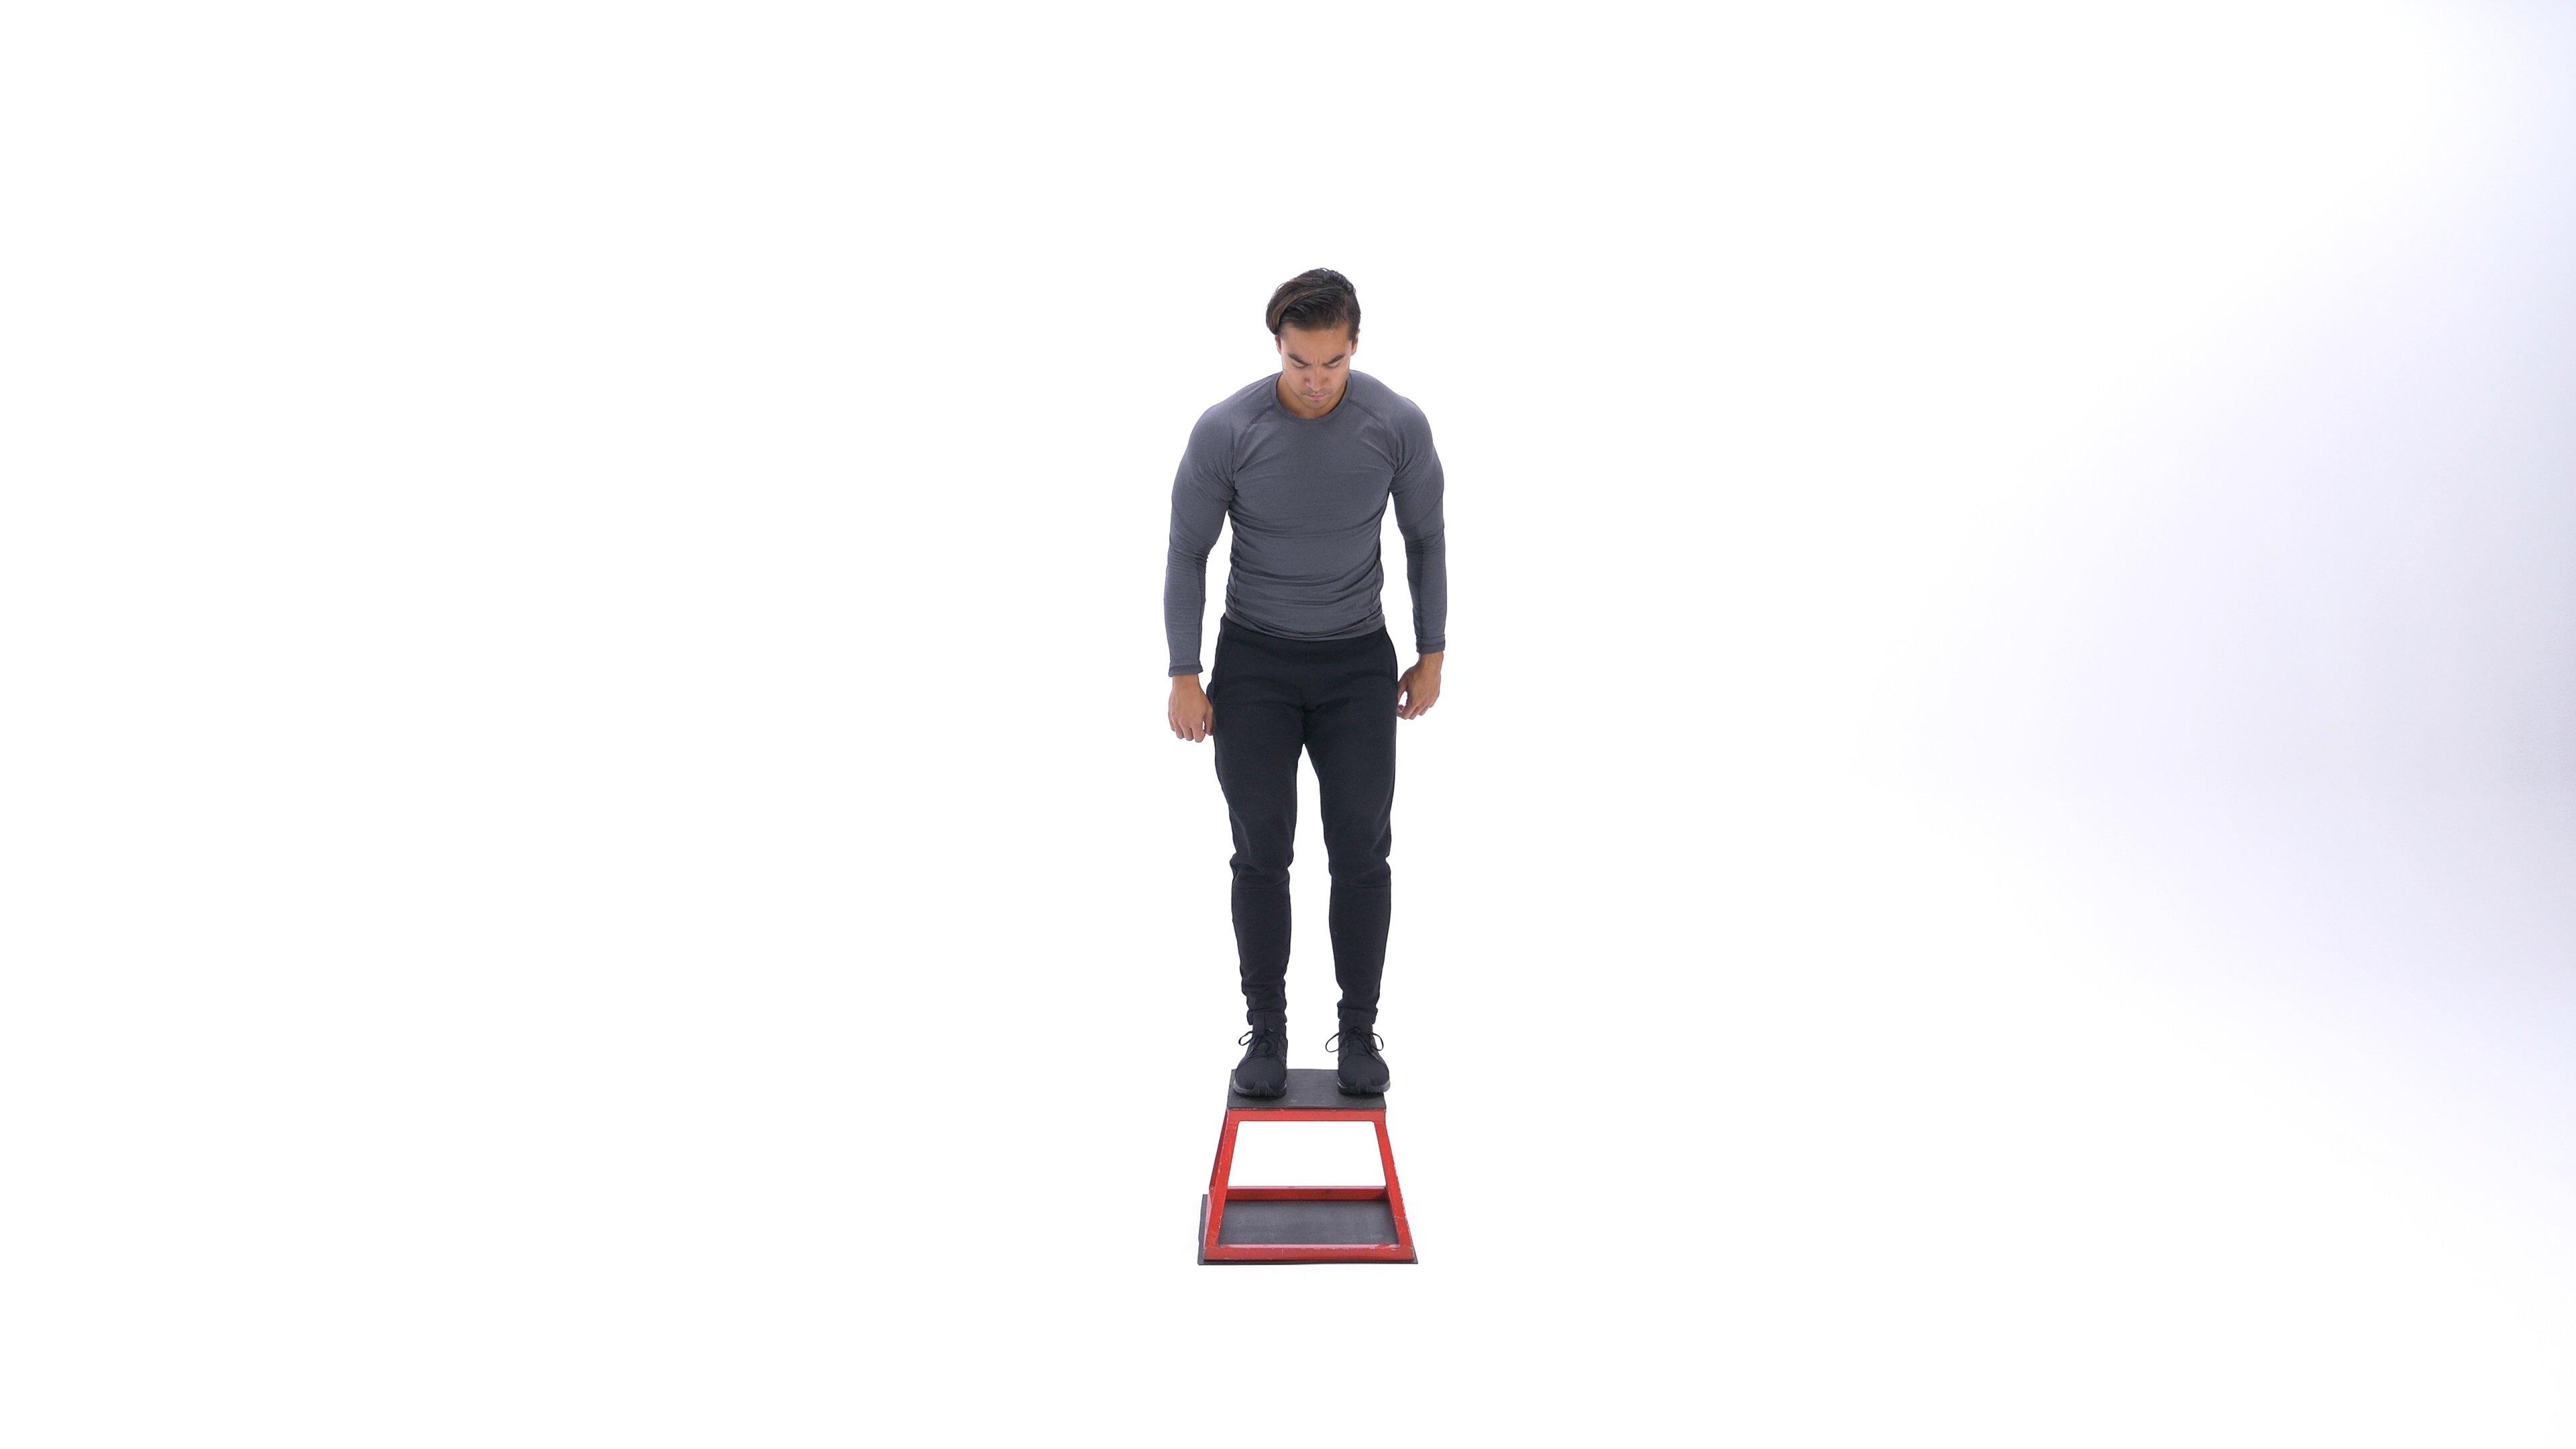 Box Jump (Multiple Response) image